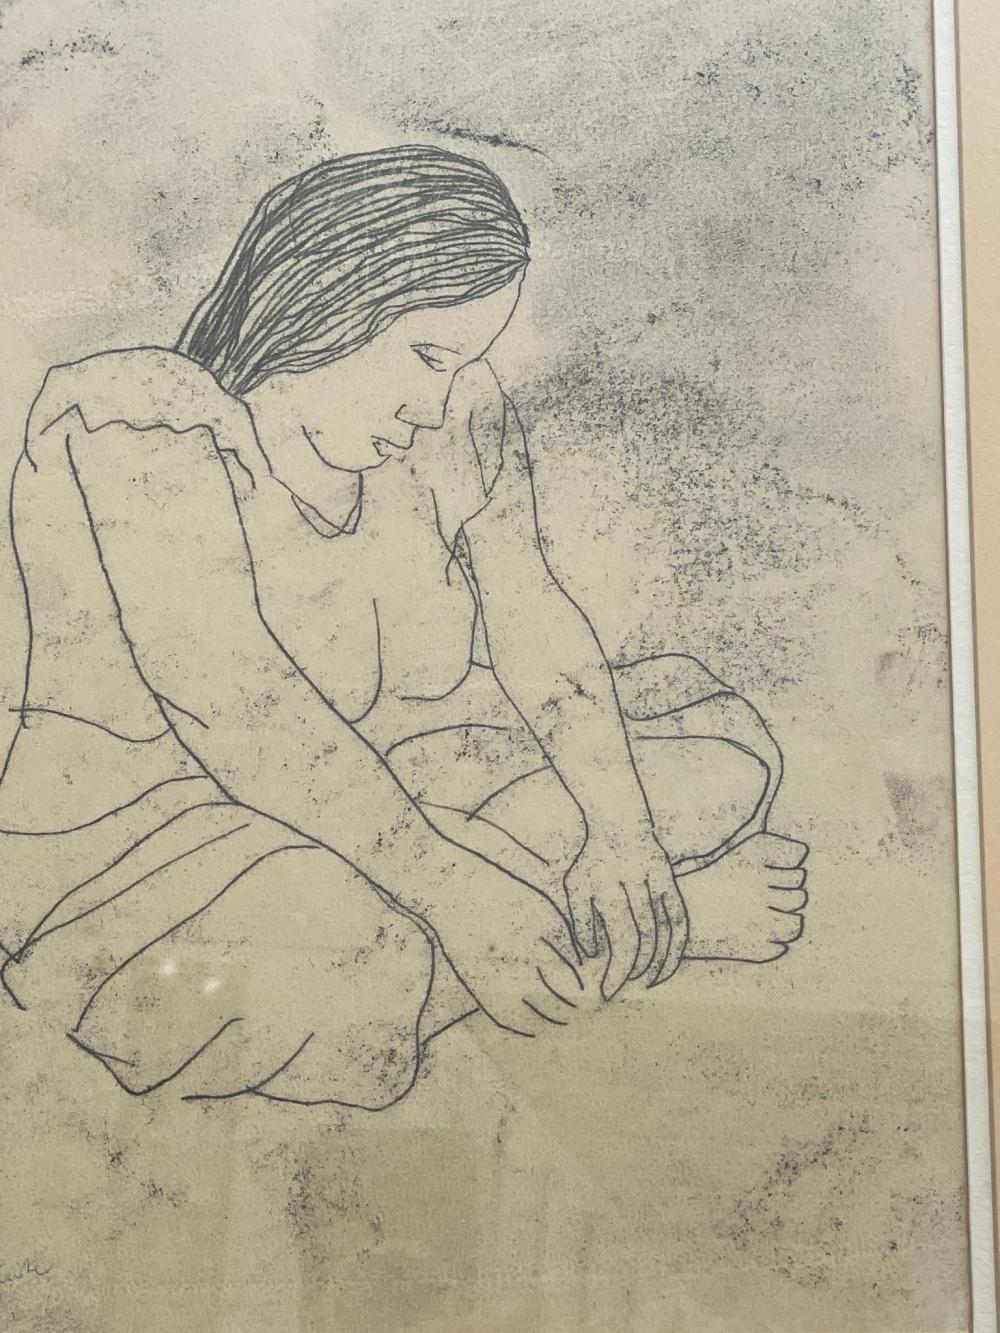 Ray Austin Crooke, Australian 1922-2015, Study of Tahitian woman, etching, 30 x 23 cm. (11.81 x 9.06 in.), Frame: 47 x 59 cm. (18 1/2 x 23.23 in.)